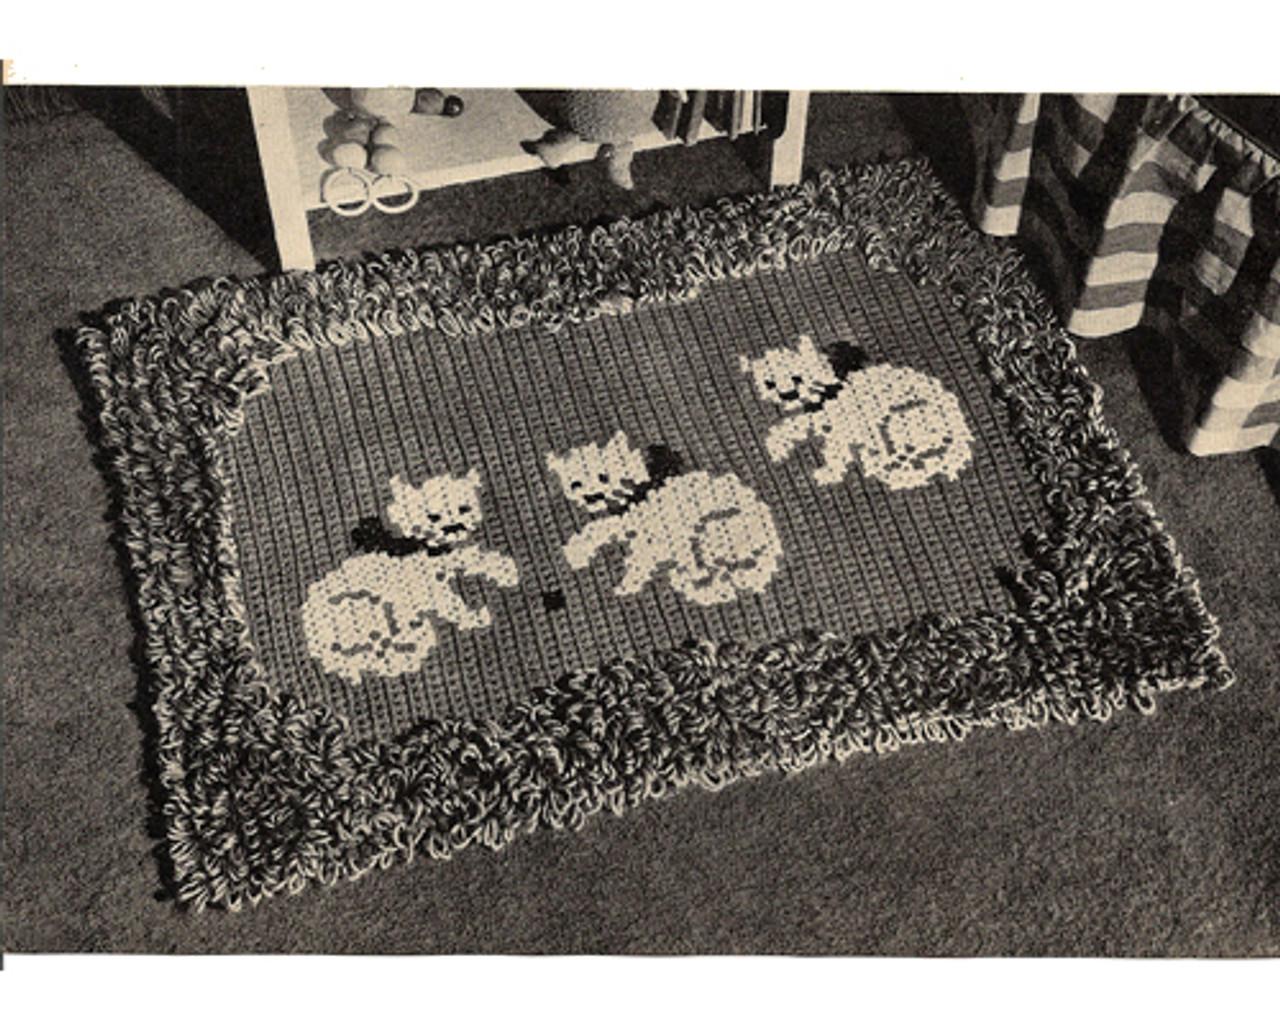 Vintage Kitten Crochet Rug Pattern in Loop Stitch